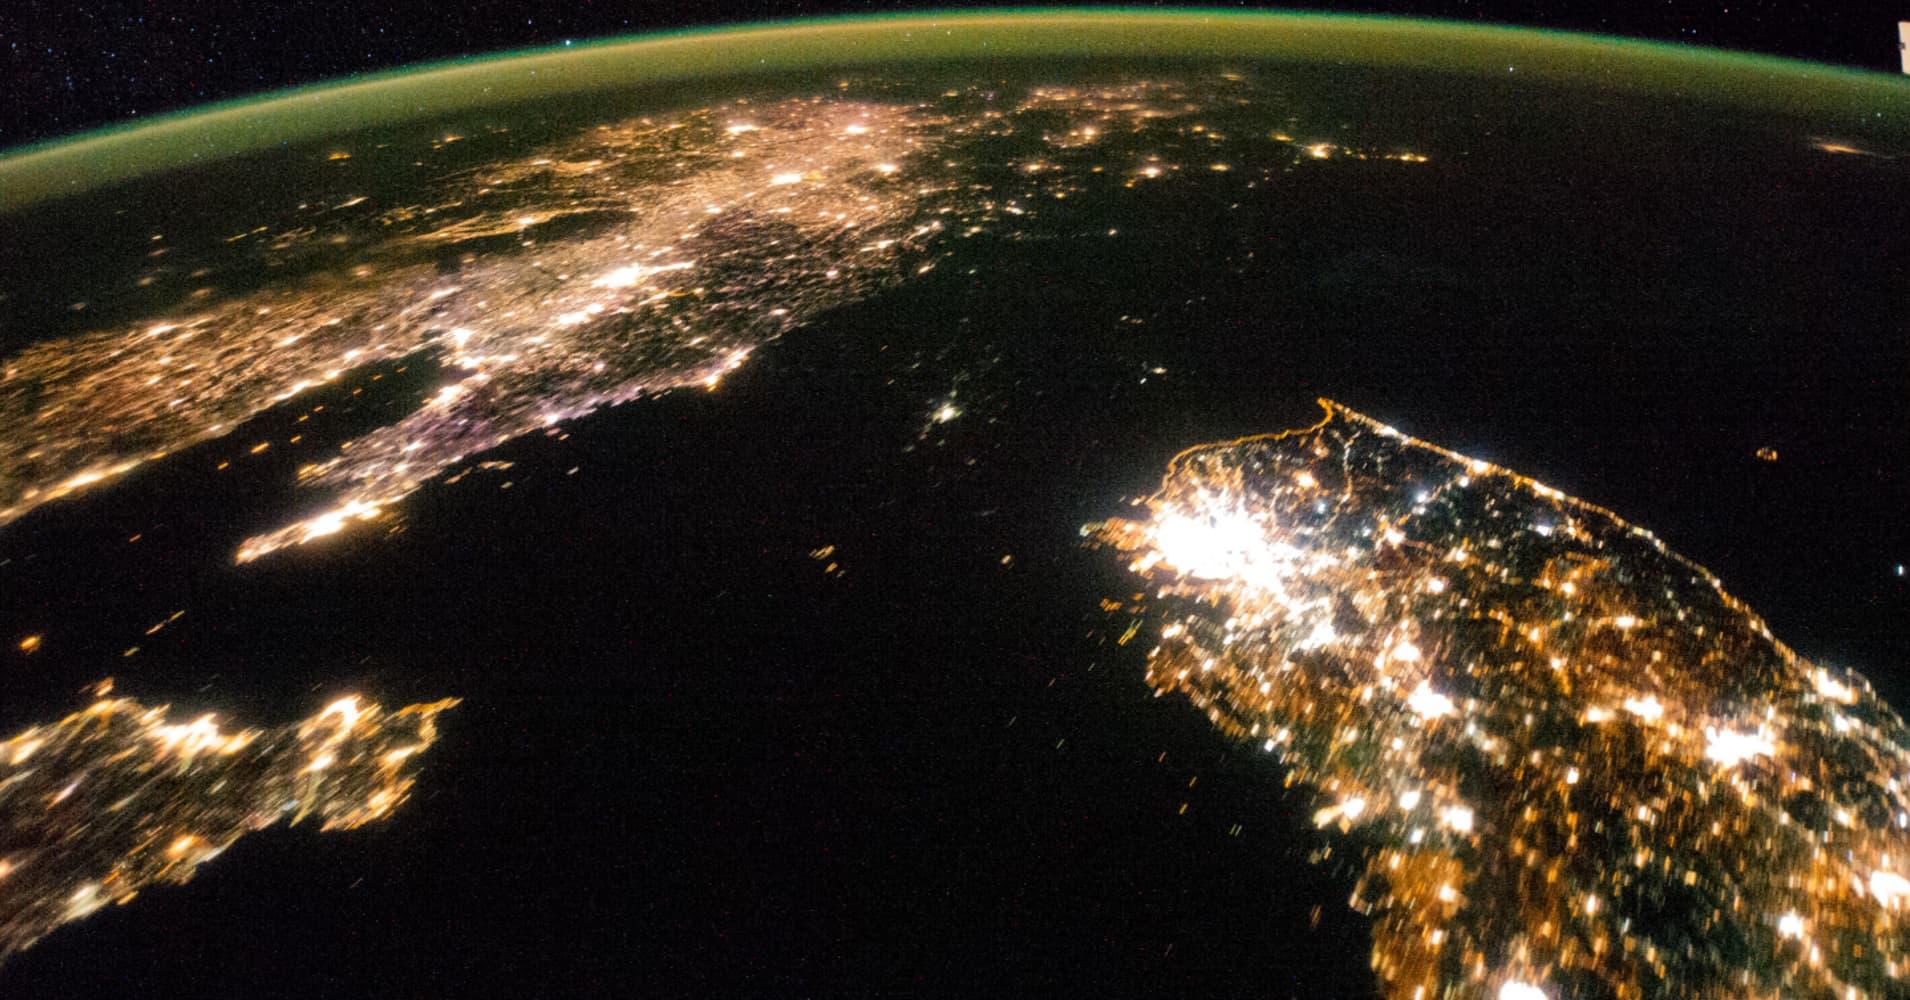 102102849-Sat-image-north-korea-night.19